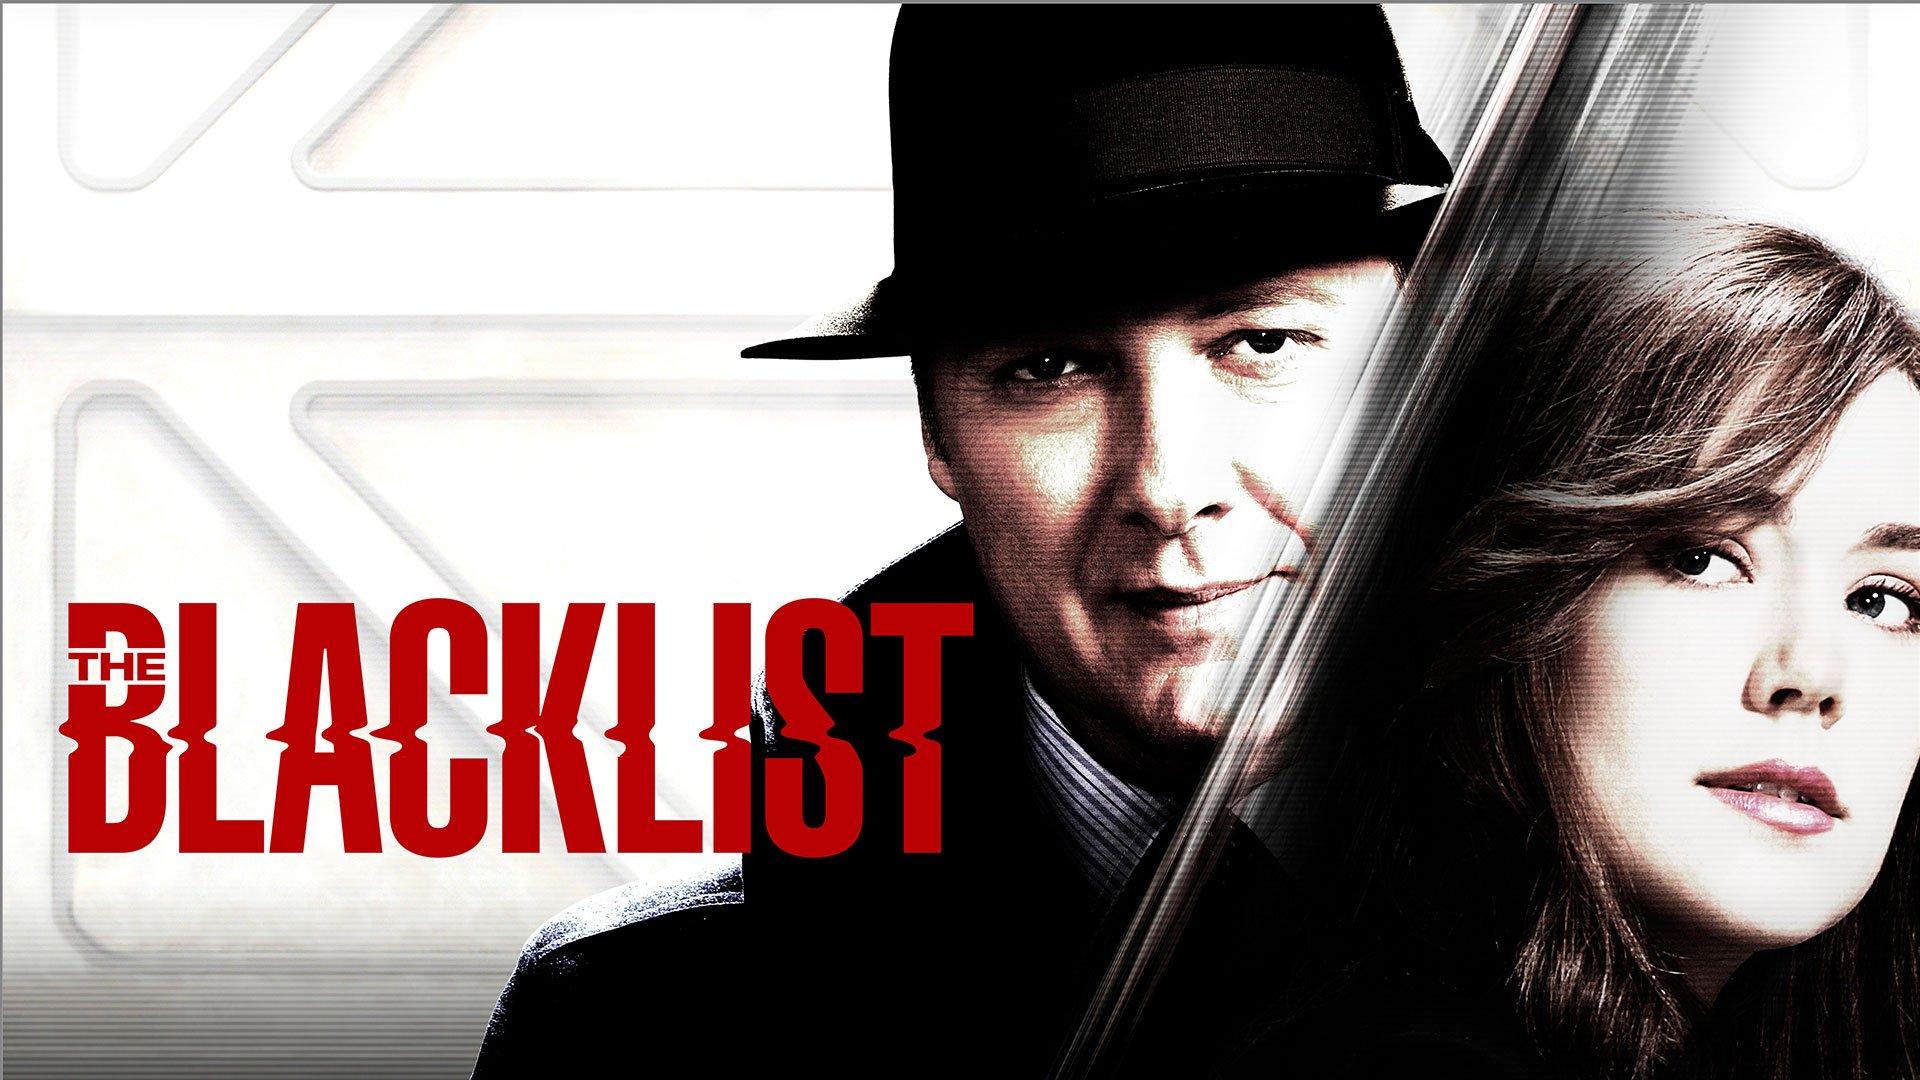 زیرنویس فصل پنجم سریال لیست سیاه the blacklist s5 4